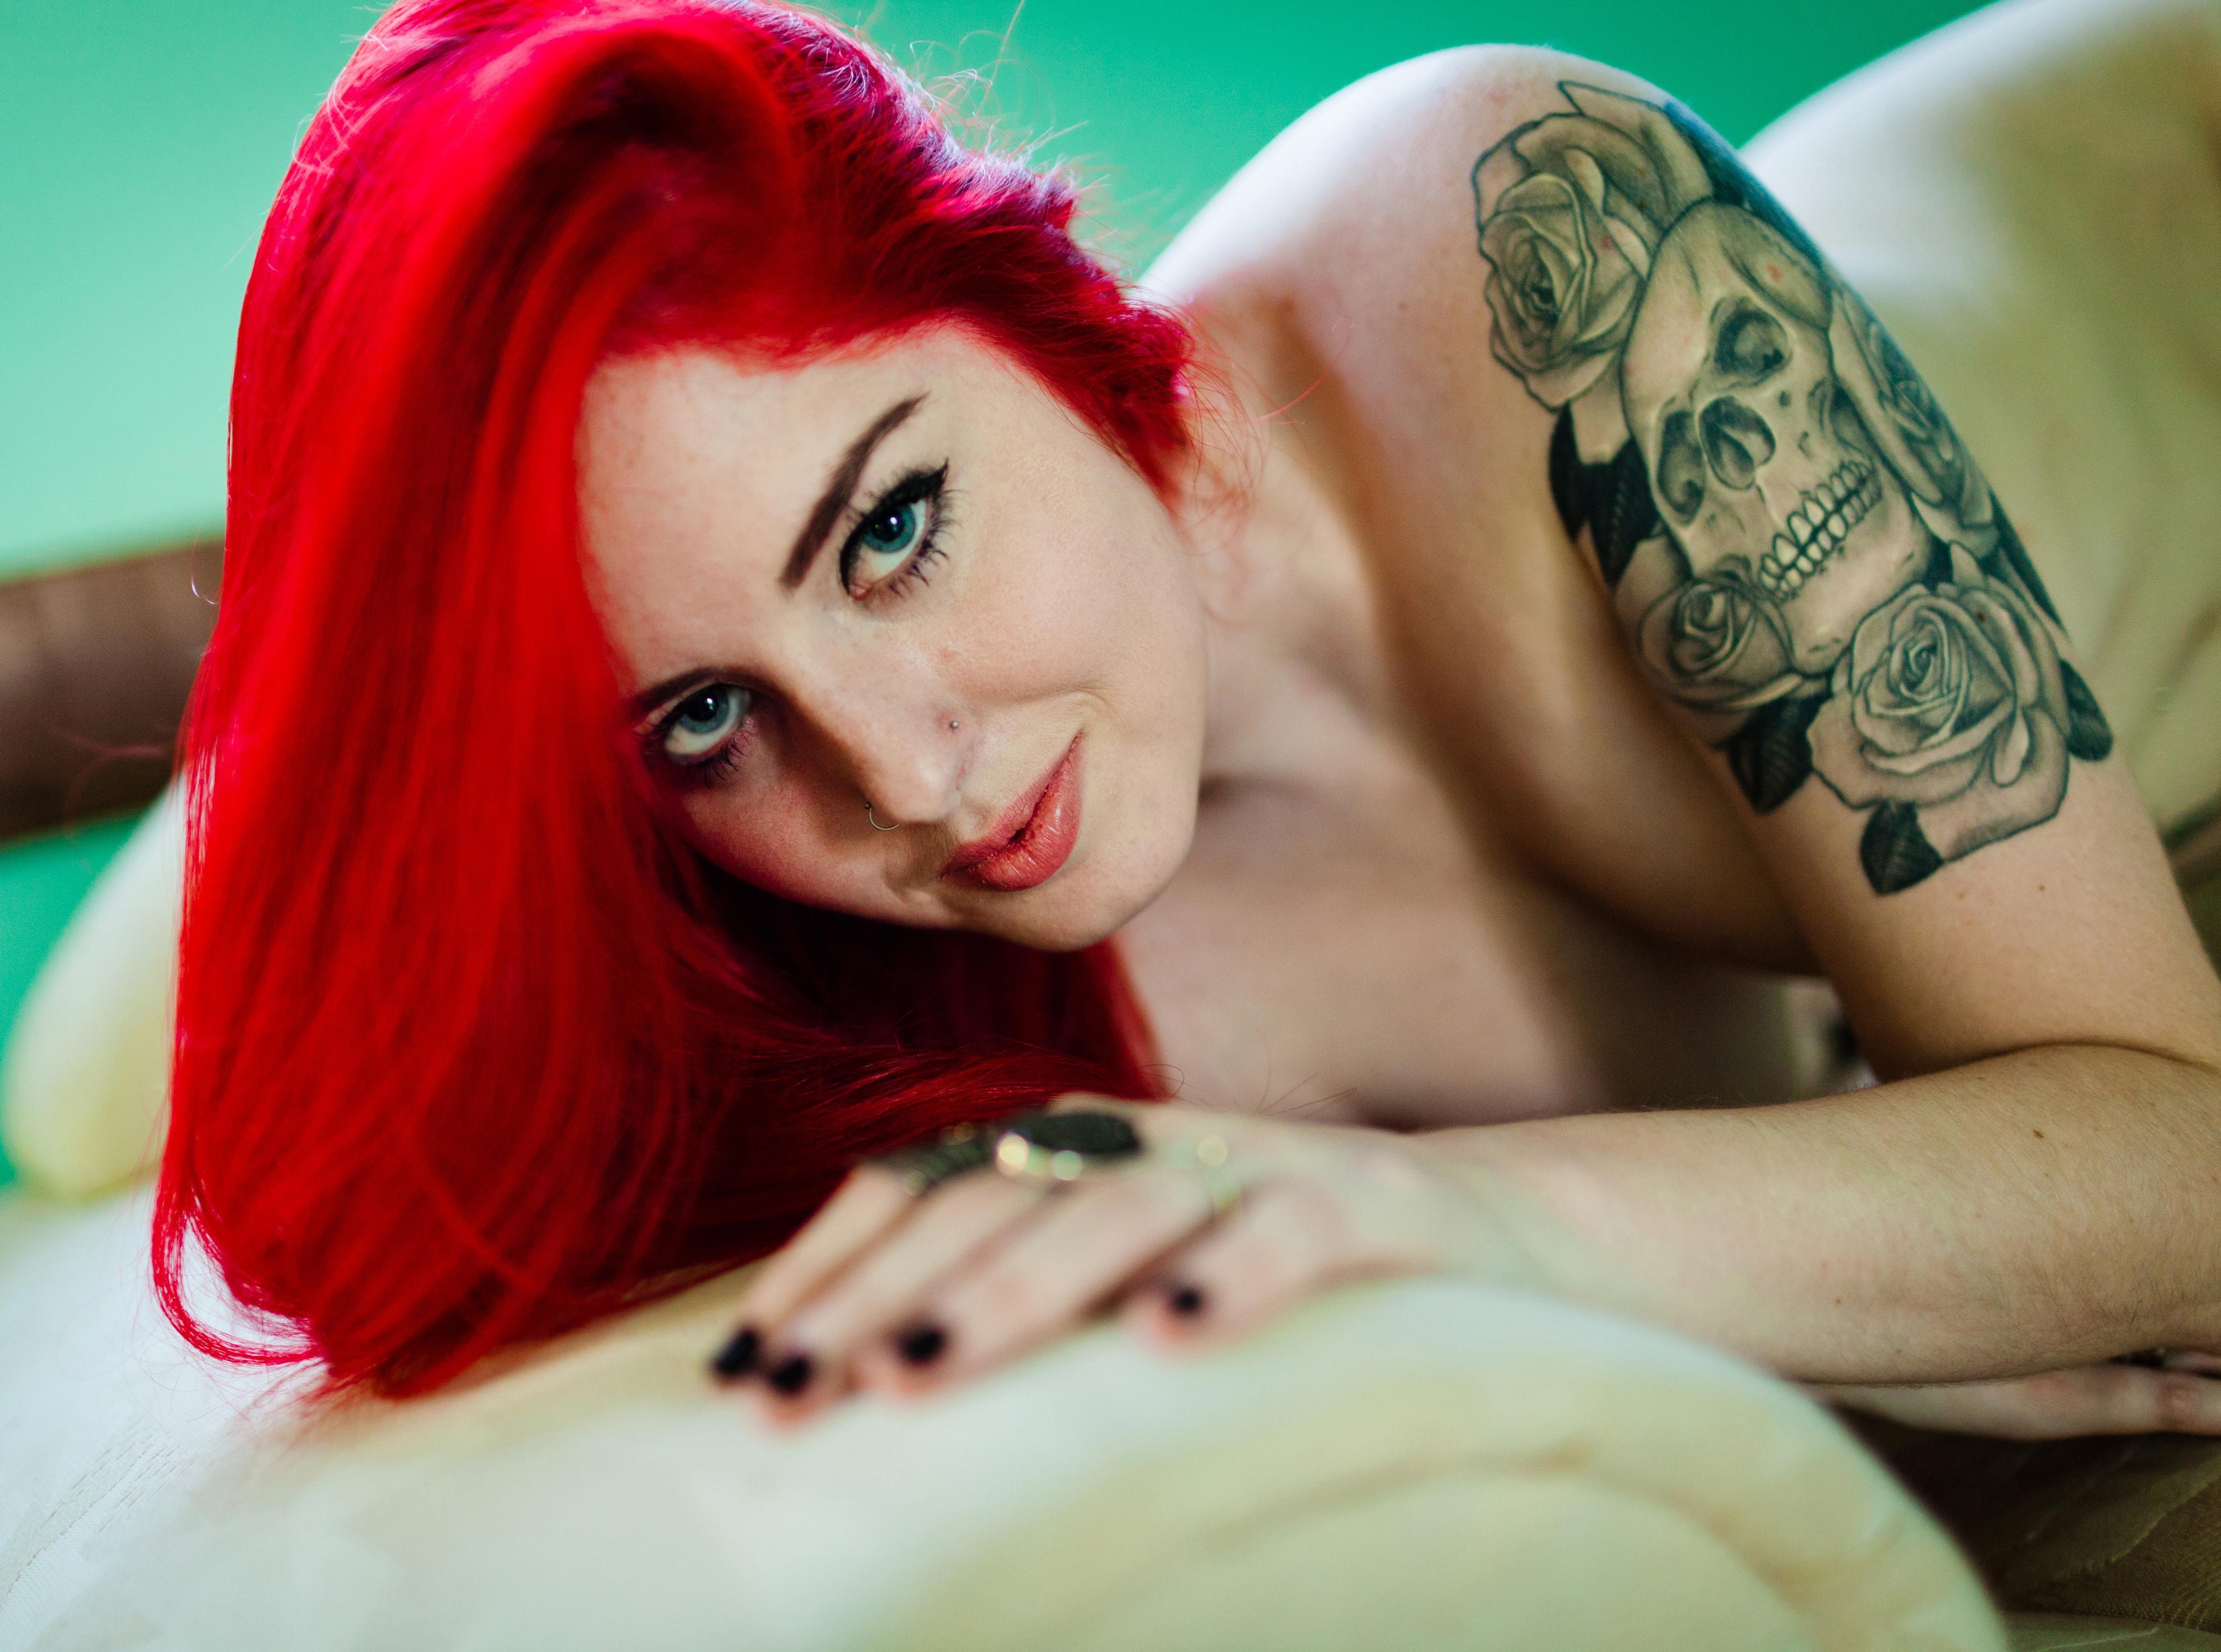 naked redhead tattoo girl